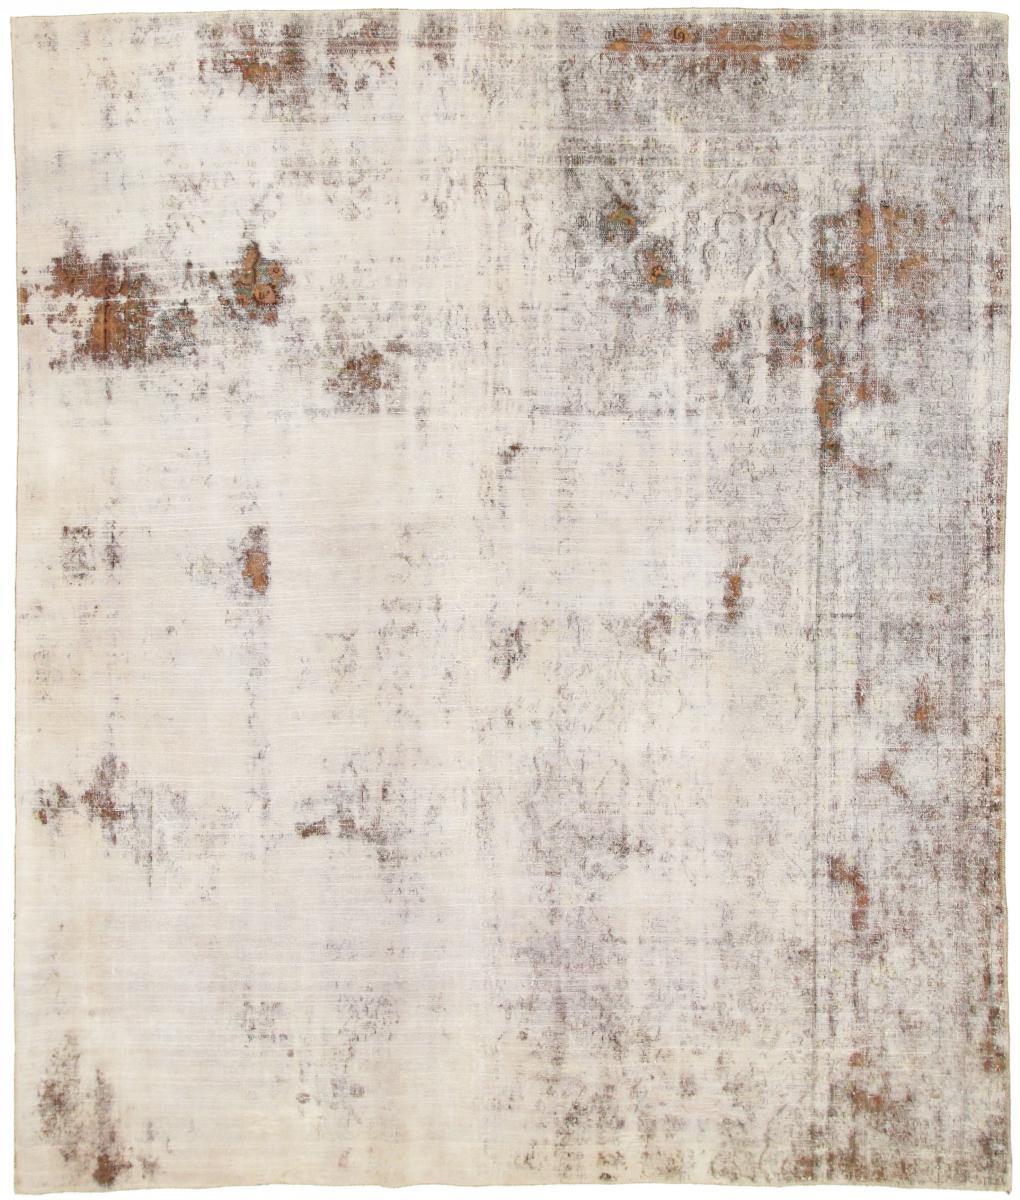 10x8 Vintage Persian Rug, 3.1mx2.6m beige brown persian vintage distressed persian carpet